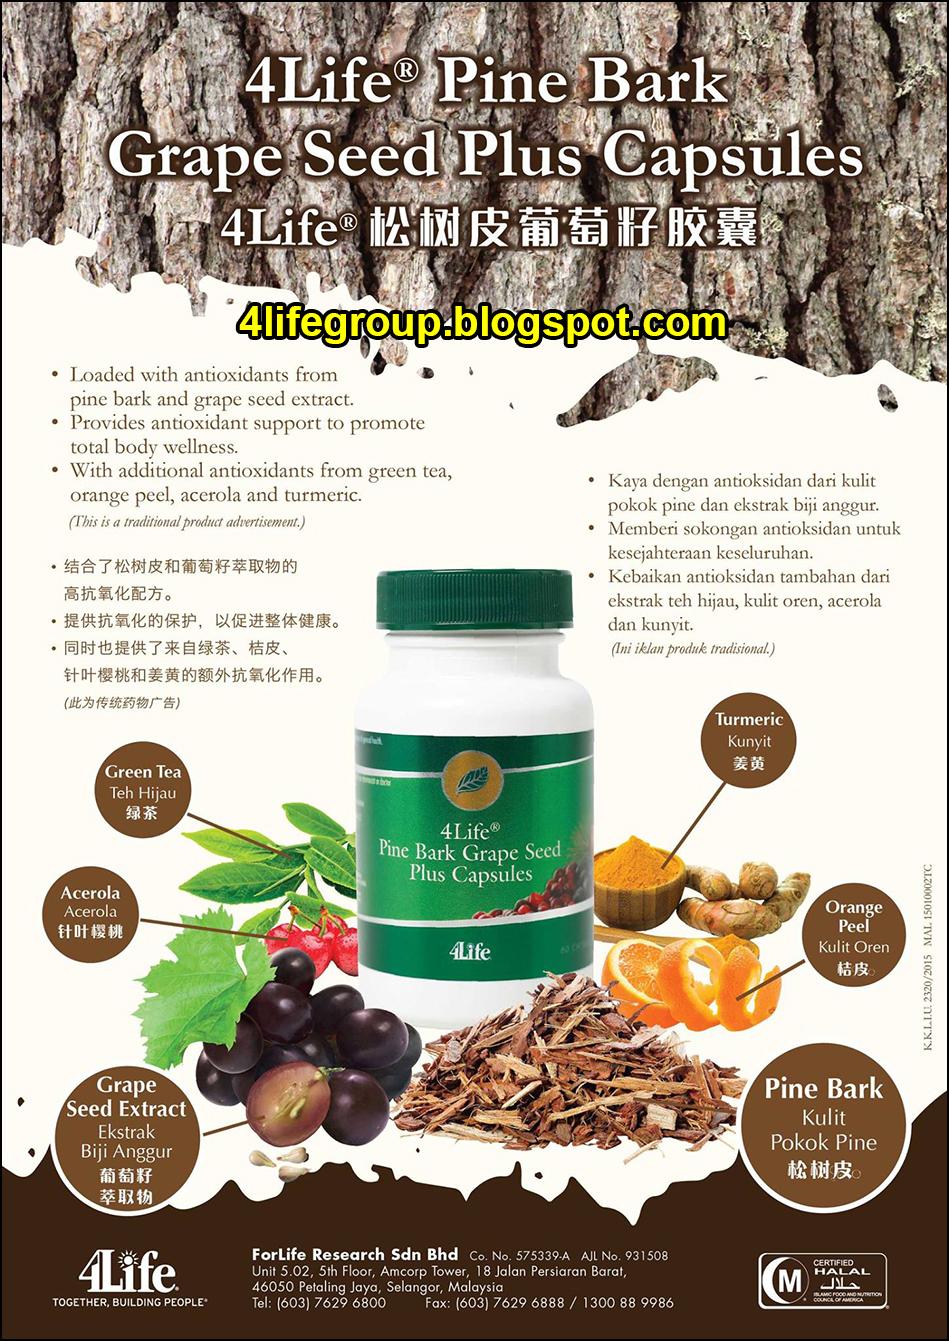 foto 4Life PBGS+ Pine Bark Grape Seed Plus Capsules